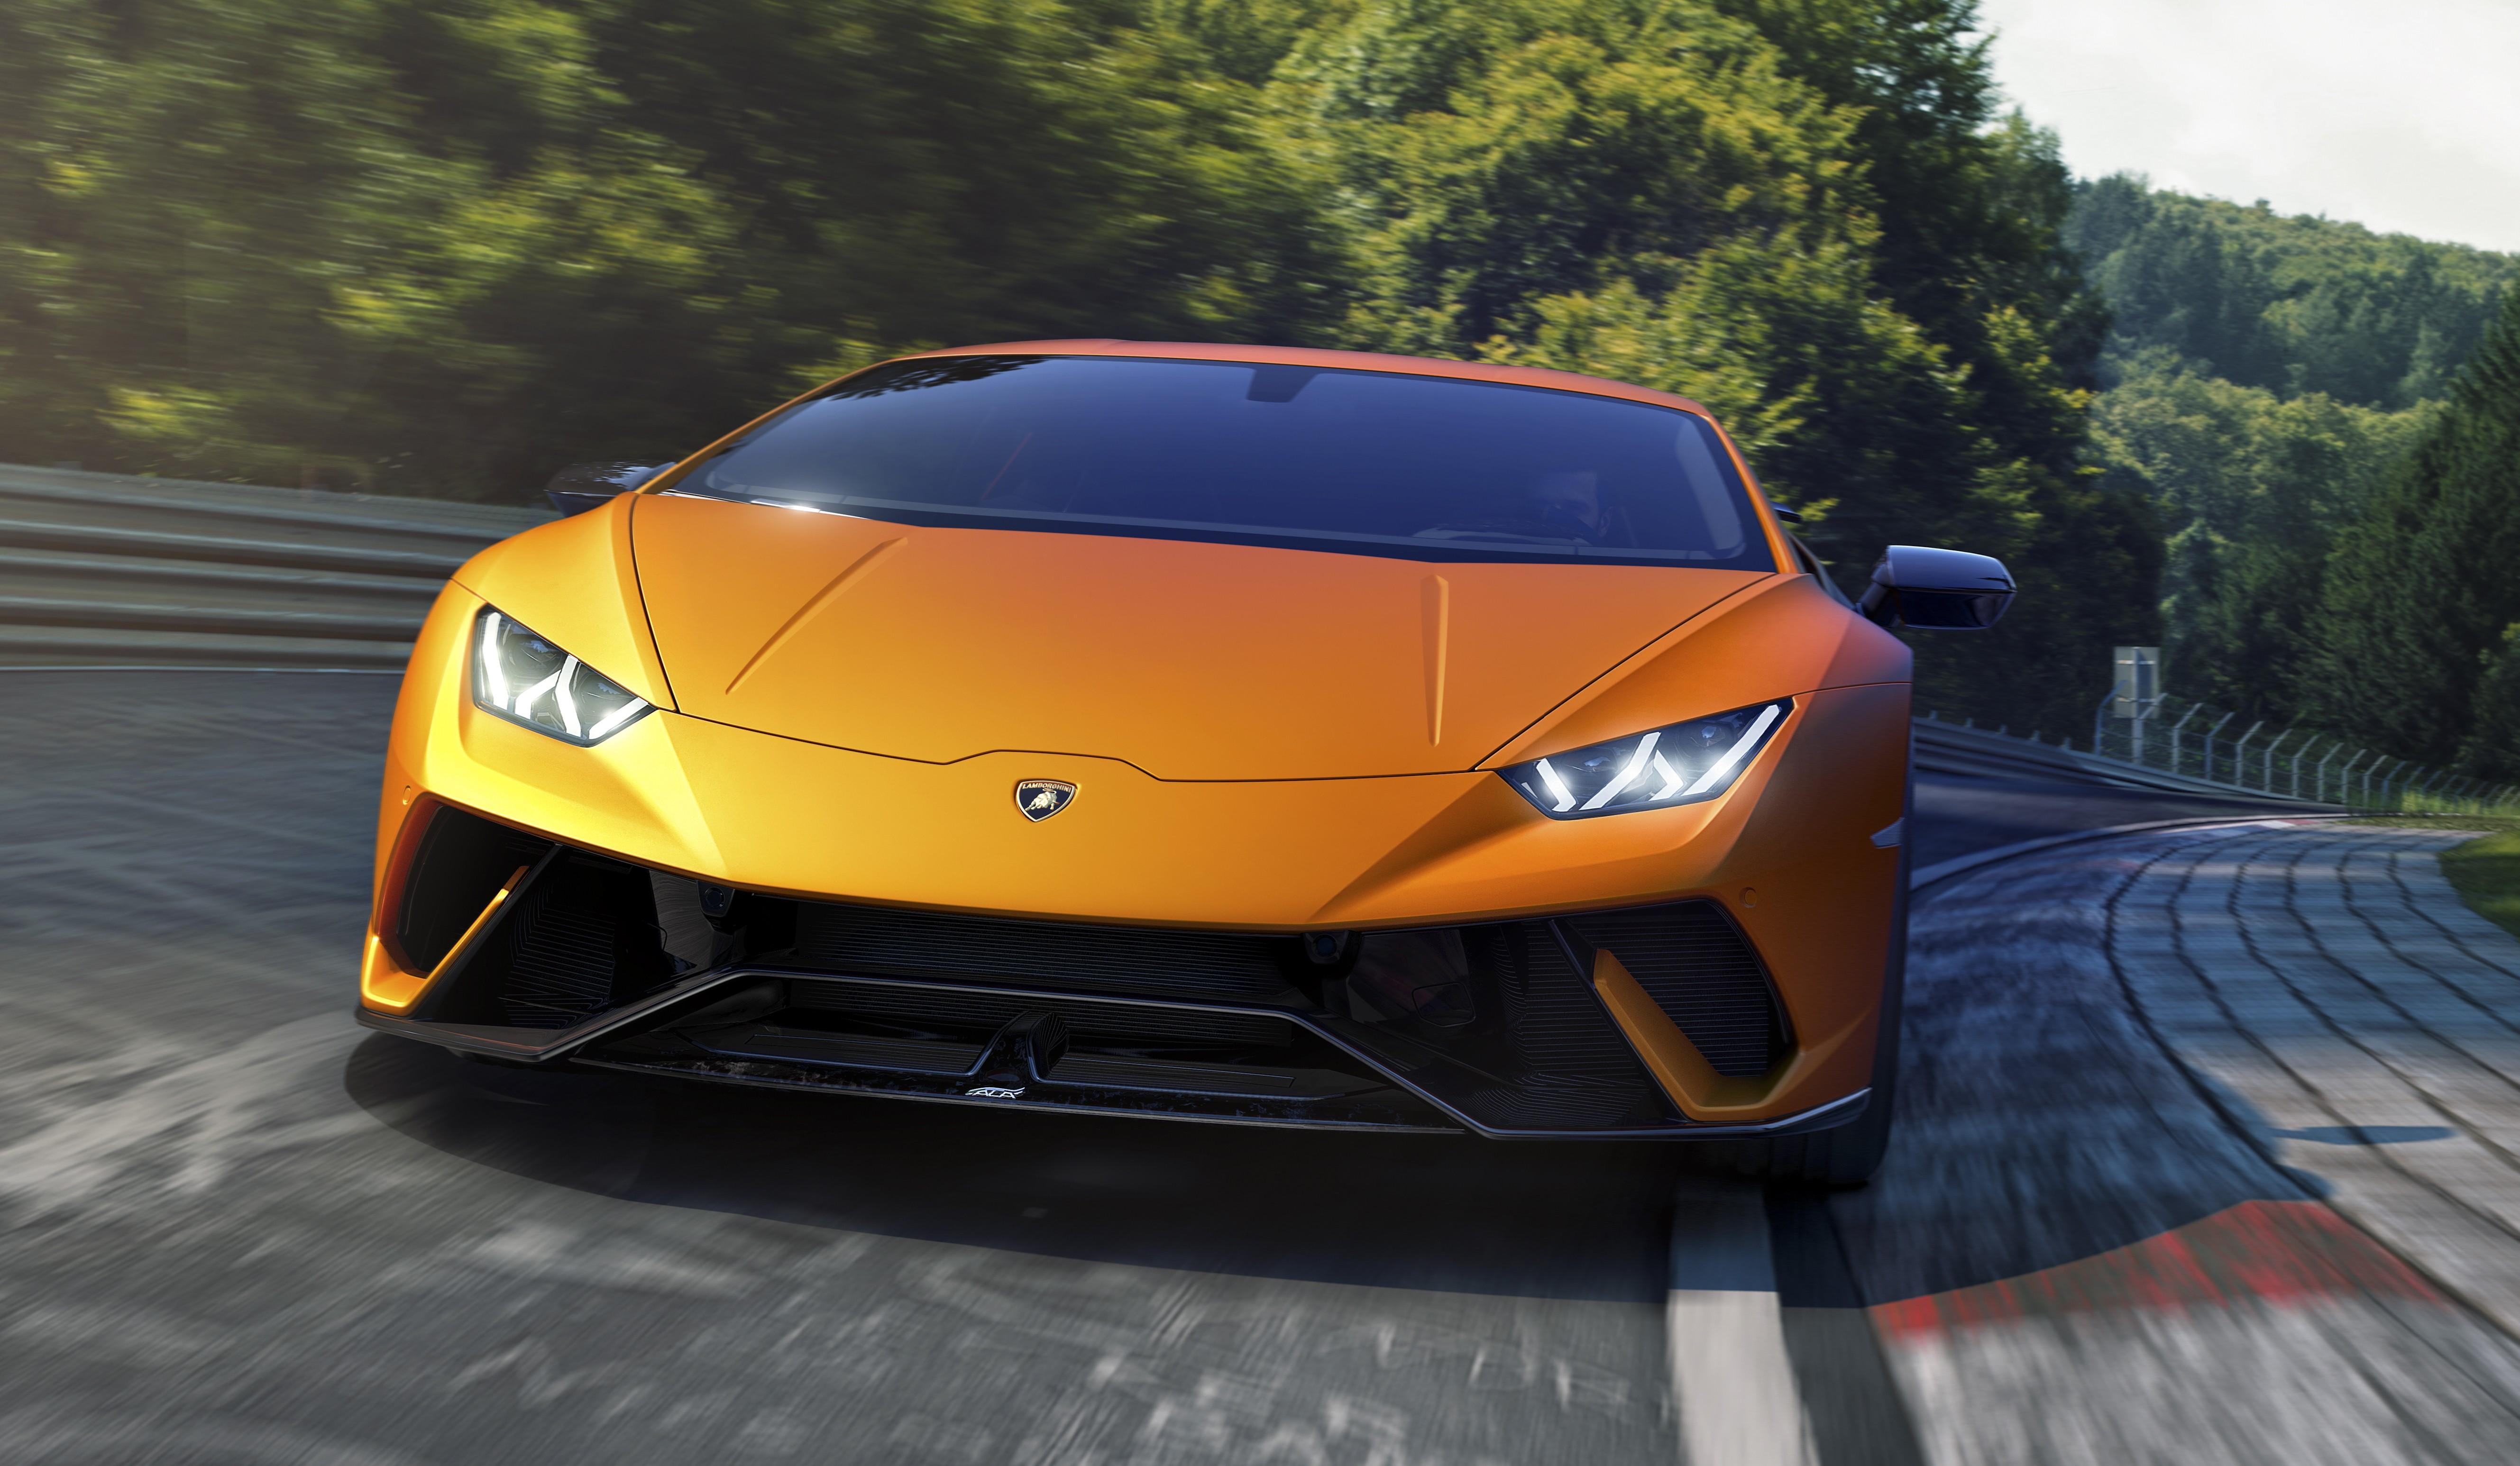 lamborghini-built-more-than-8000-huracan-models-since-the-supercars-debut_3 Extraordinary Lamborghini Huracan Need for Speed Cars Trend